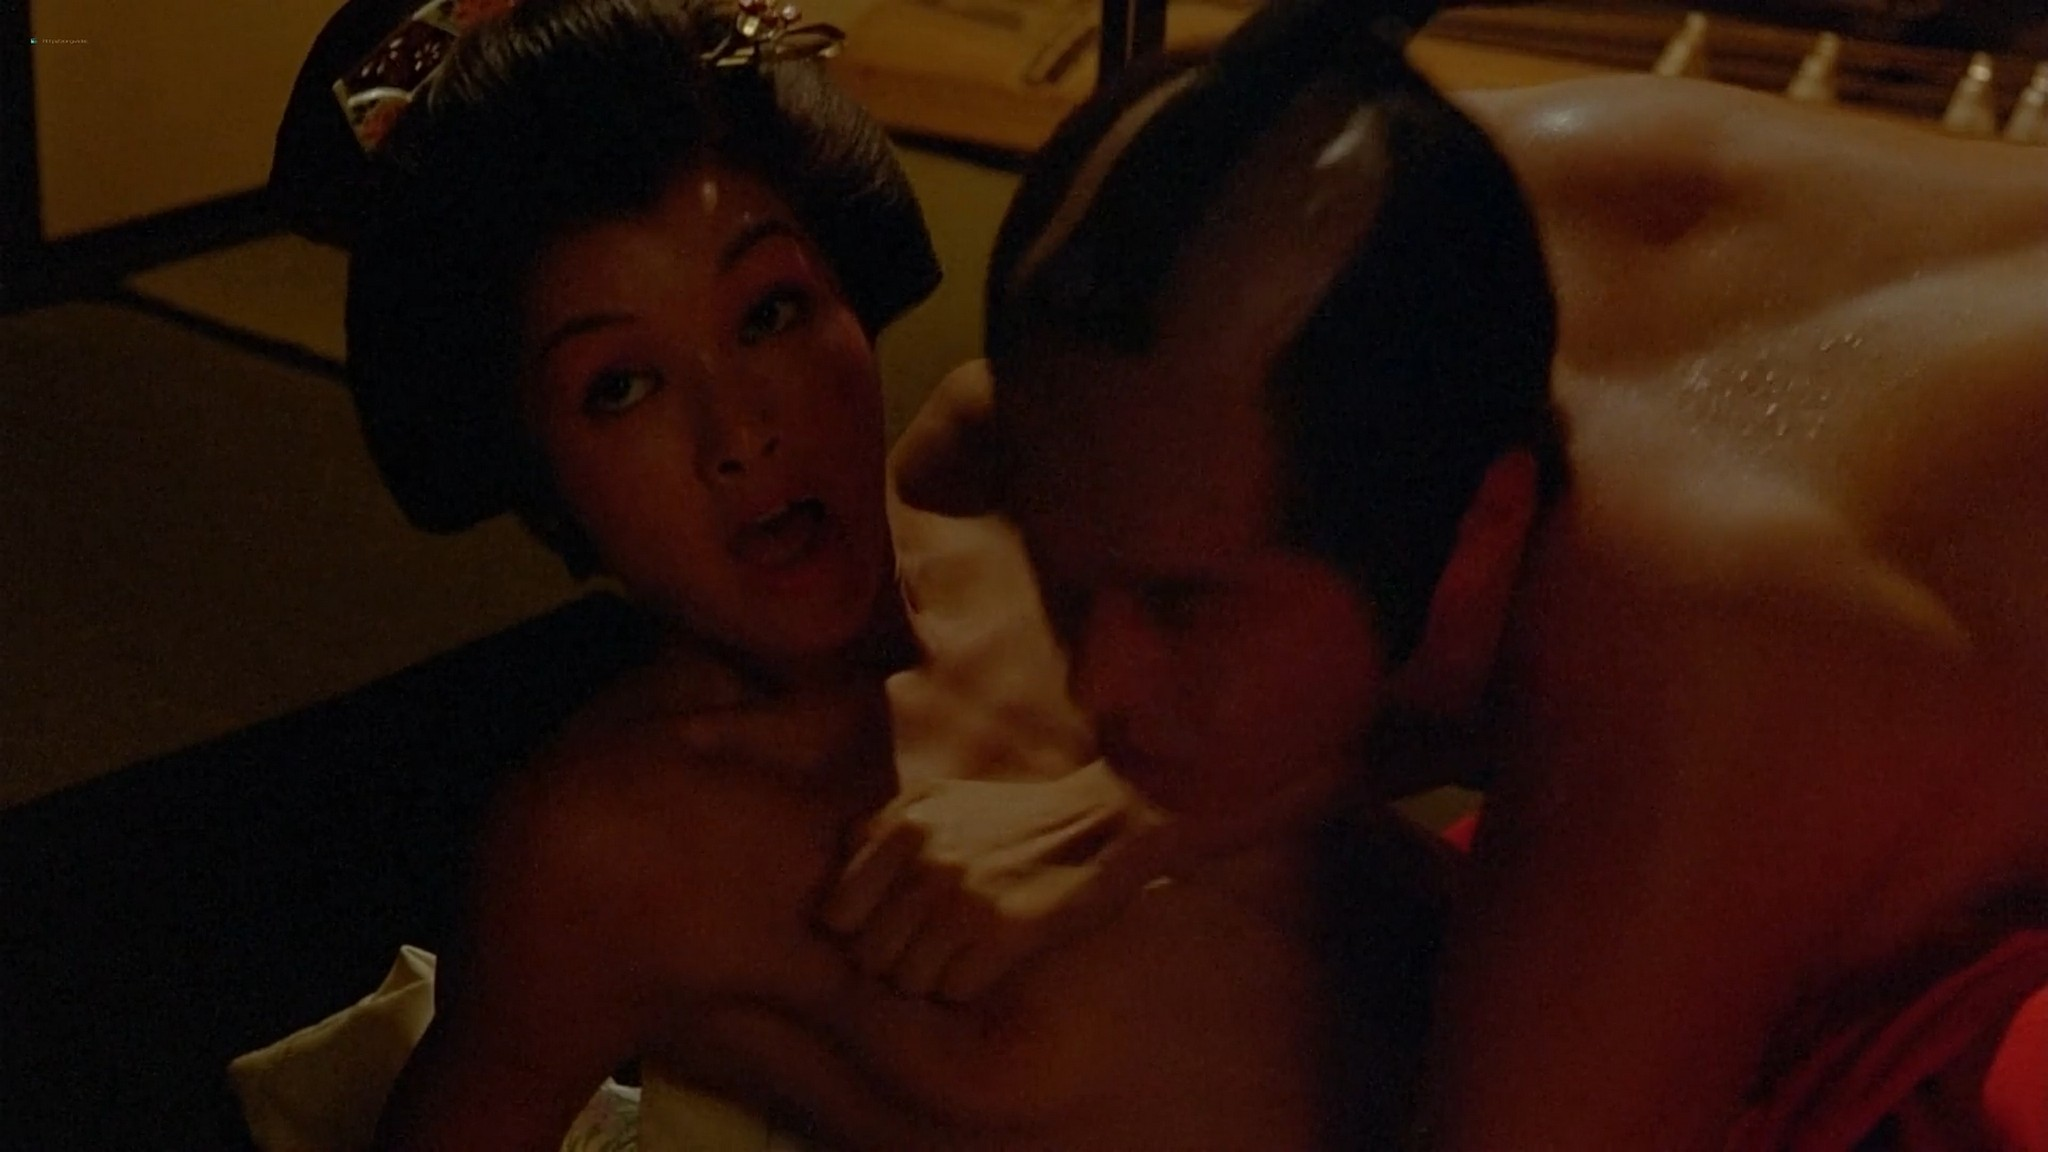 Susan George nude hot sex Mako Hattori nude The House Where Evil Dwells 1982 1080p BluRay 2